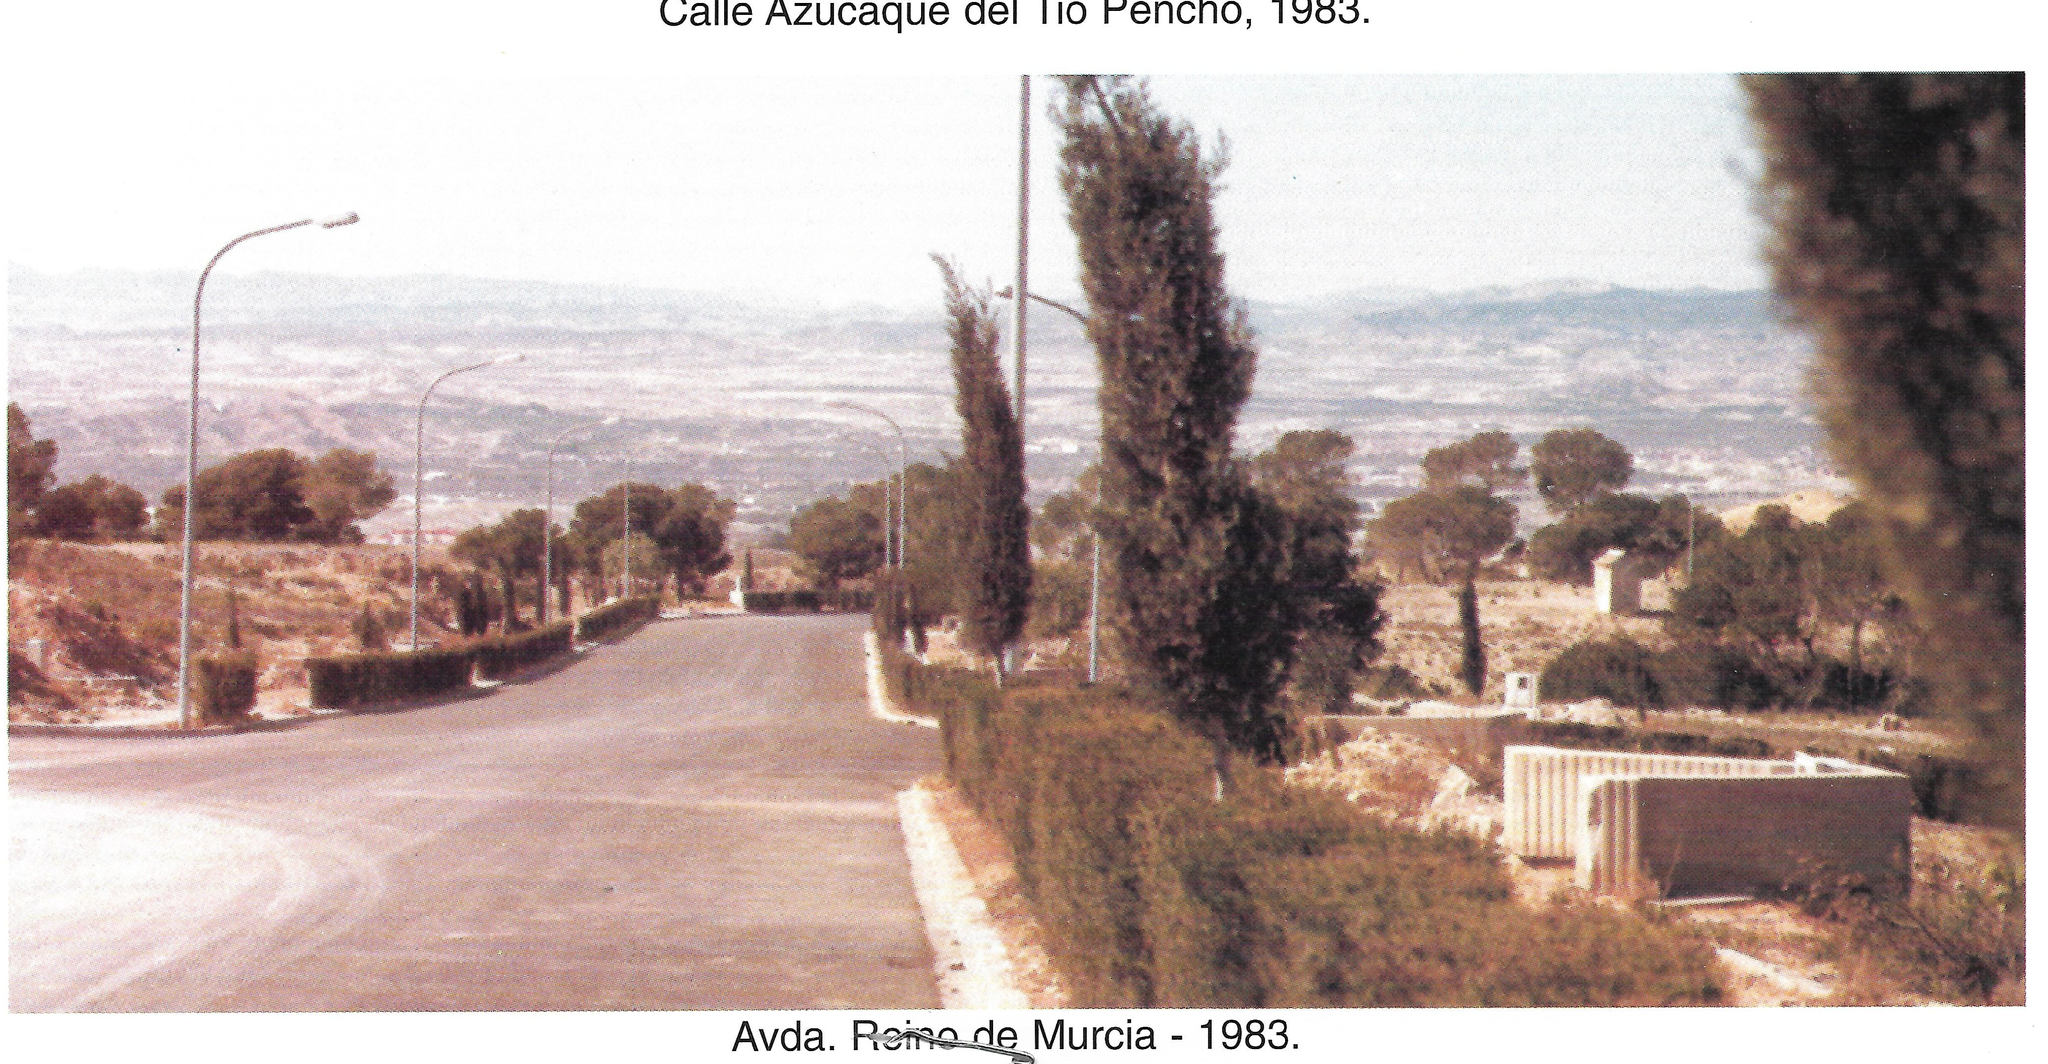 Avenida Reino de Murcia